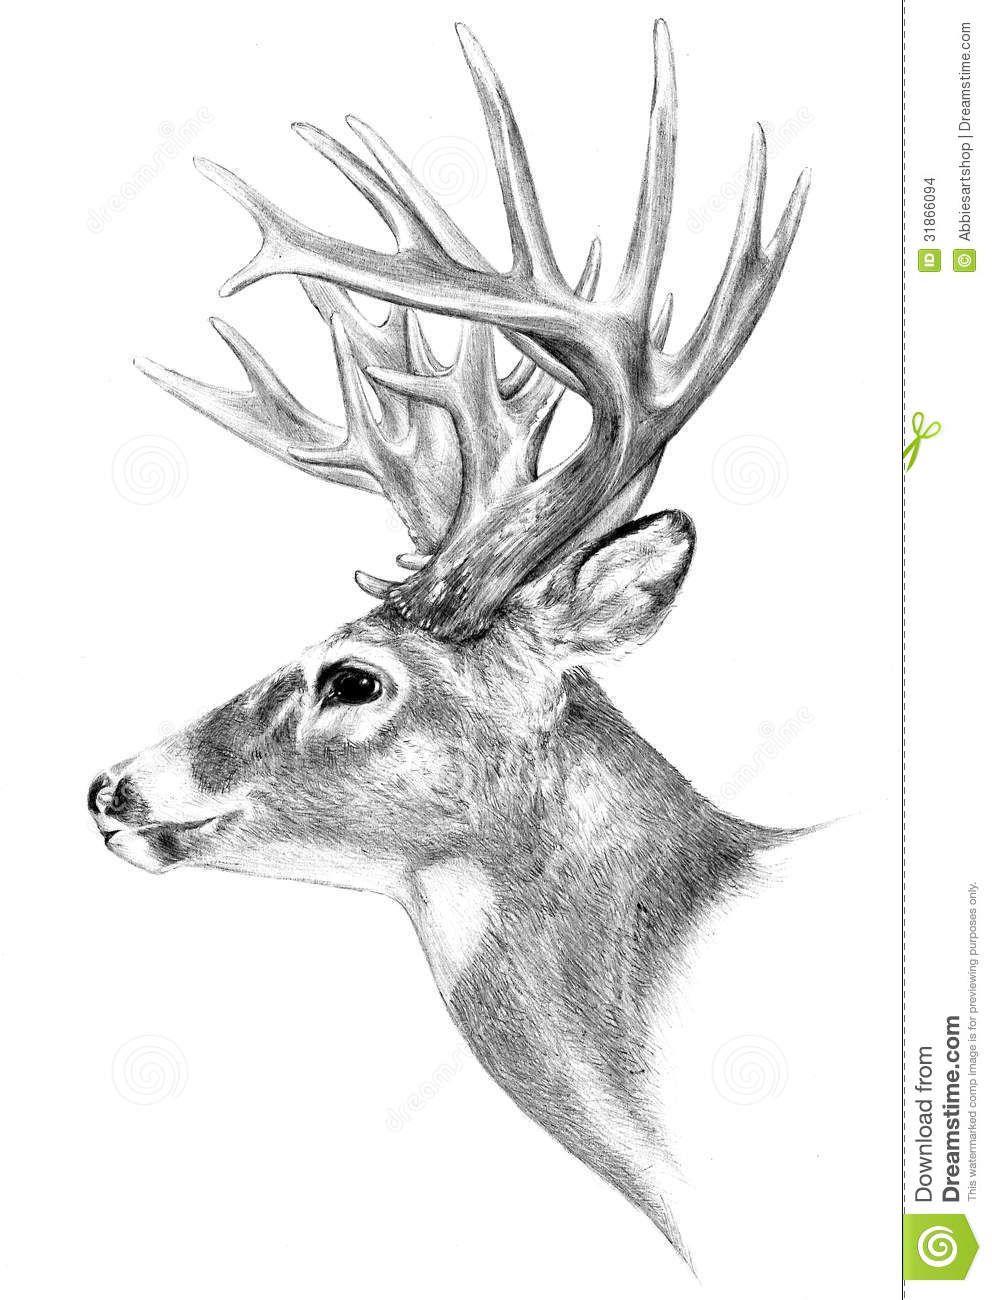 Line Drawings Of Animals Deer : Deer pencil drawing google search draww pinterest